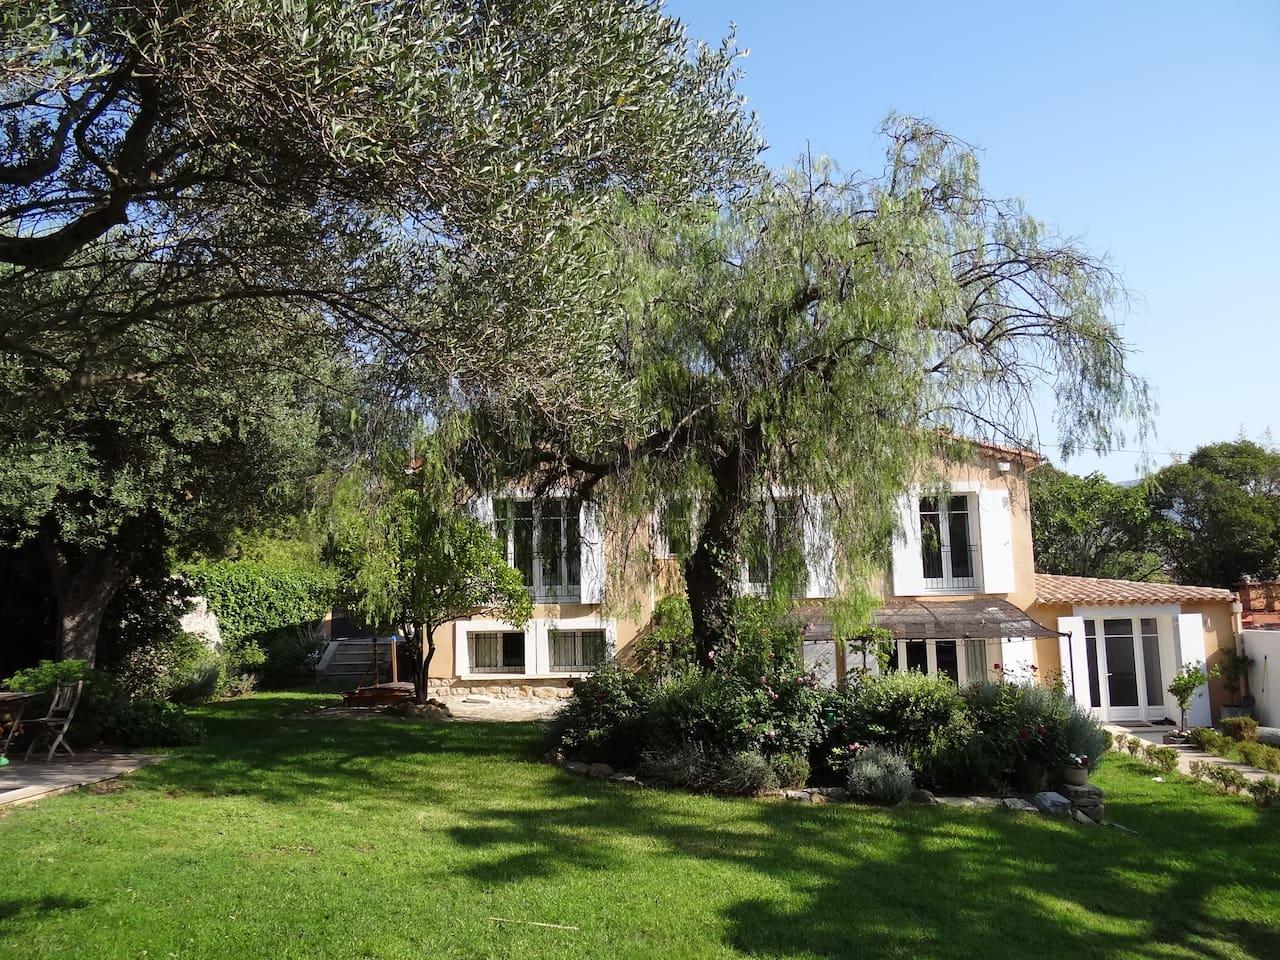 Maison vue du jardin / House from the garden